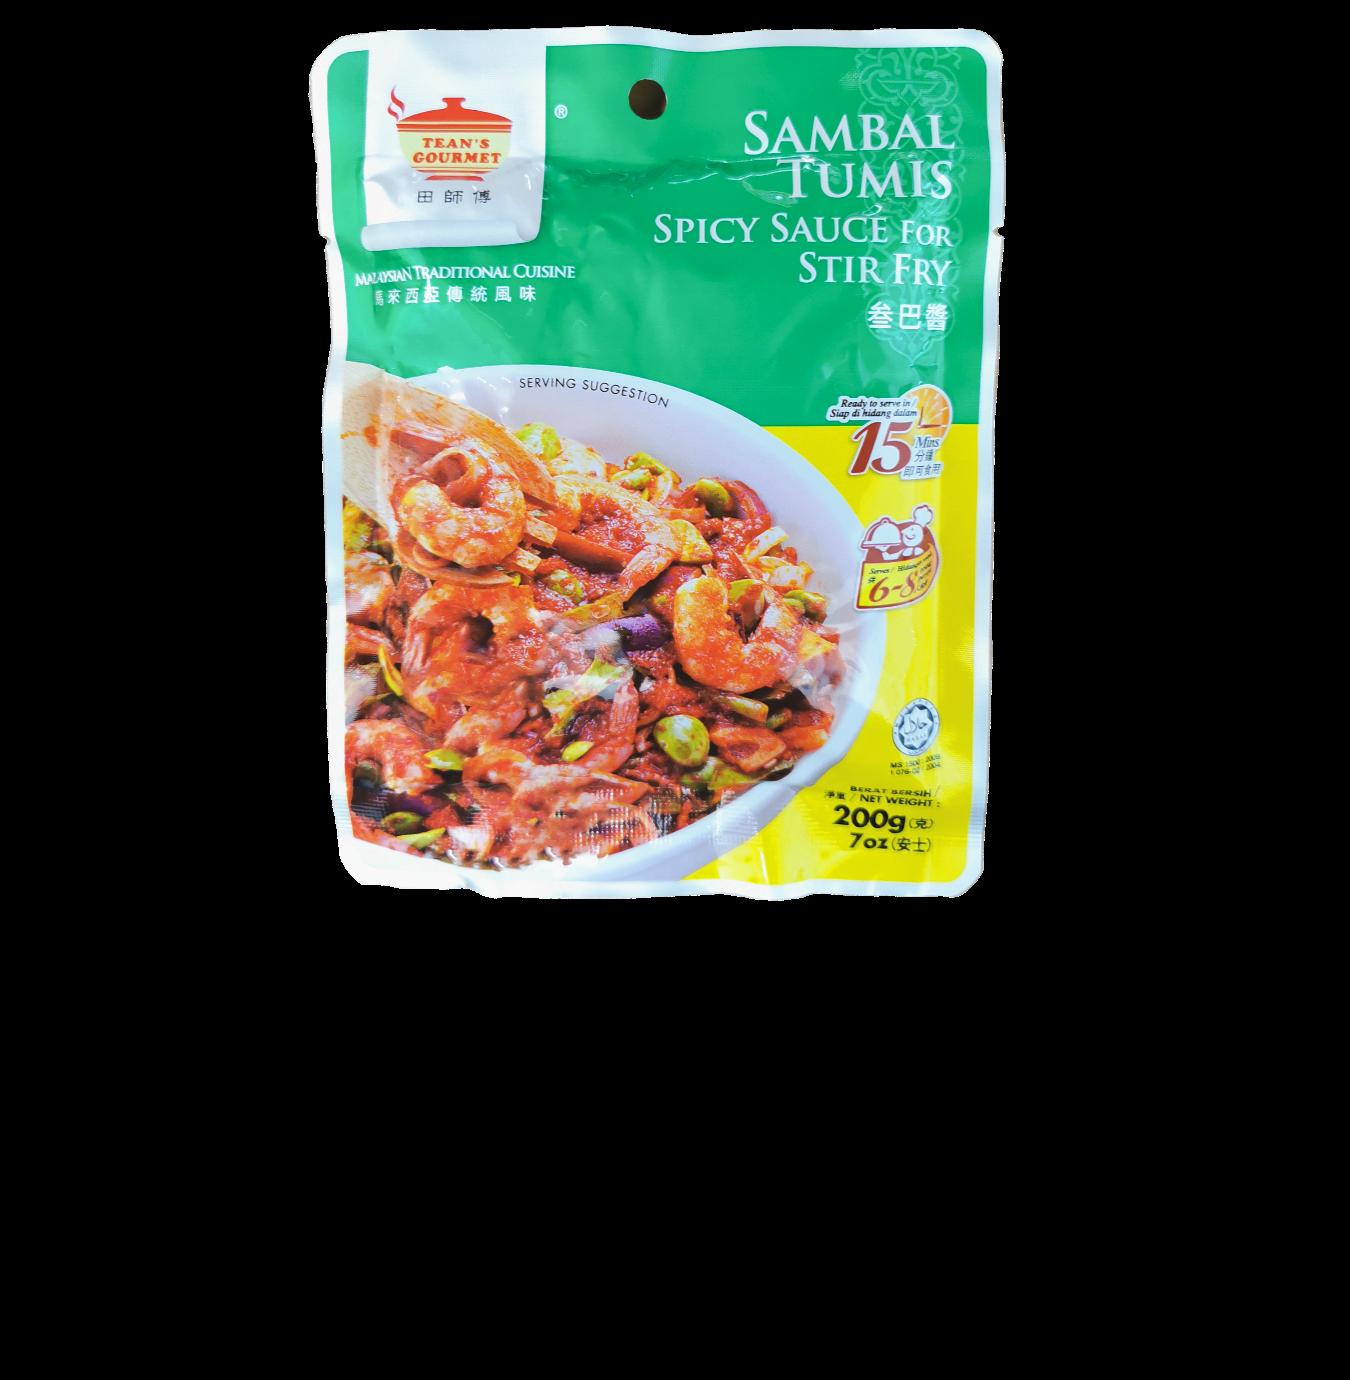 Teans Gourmet Sambal Tumis (Spicy Sauce for Stir Fry)